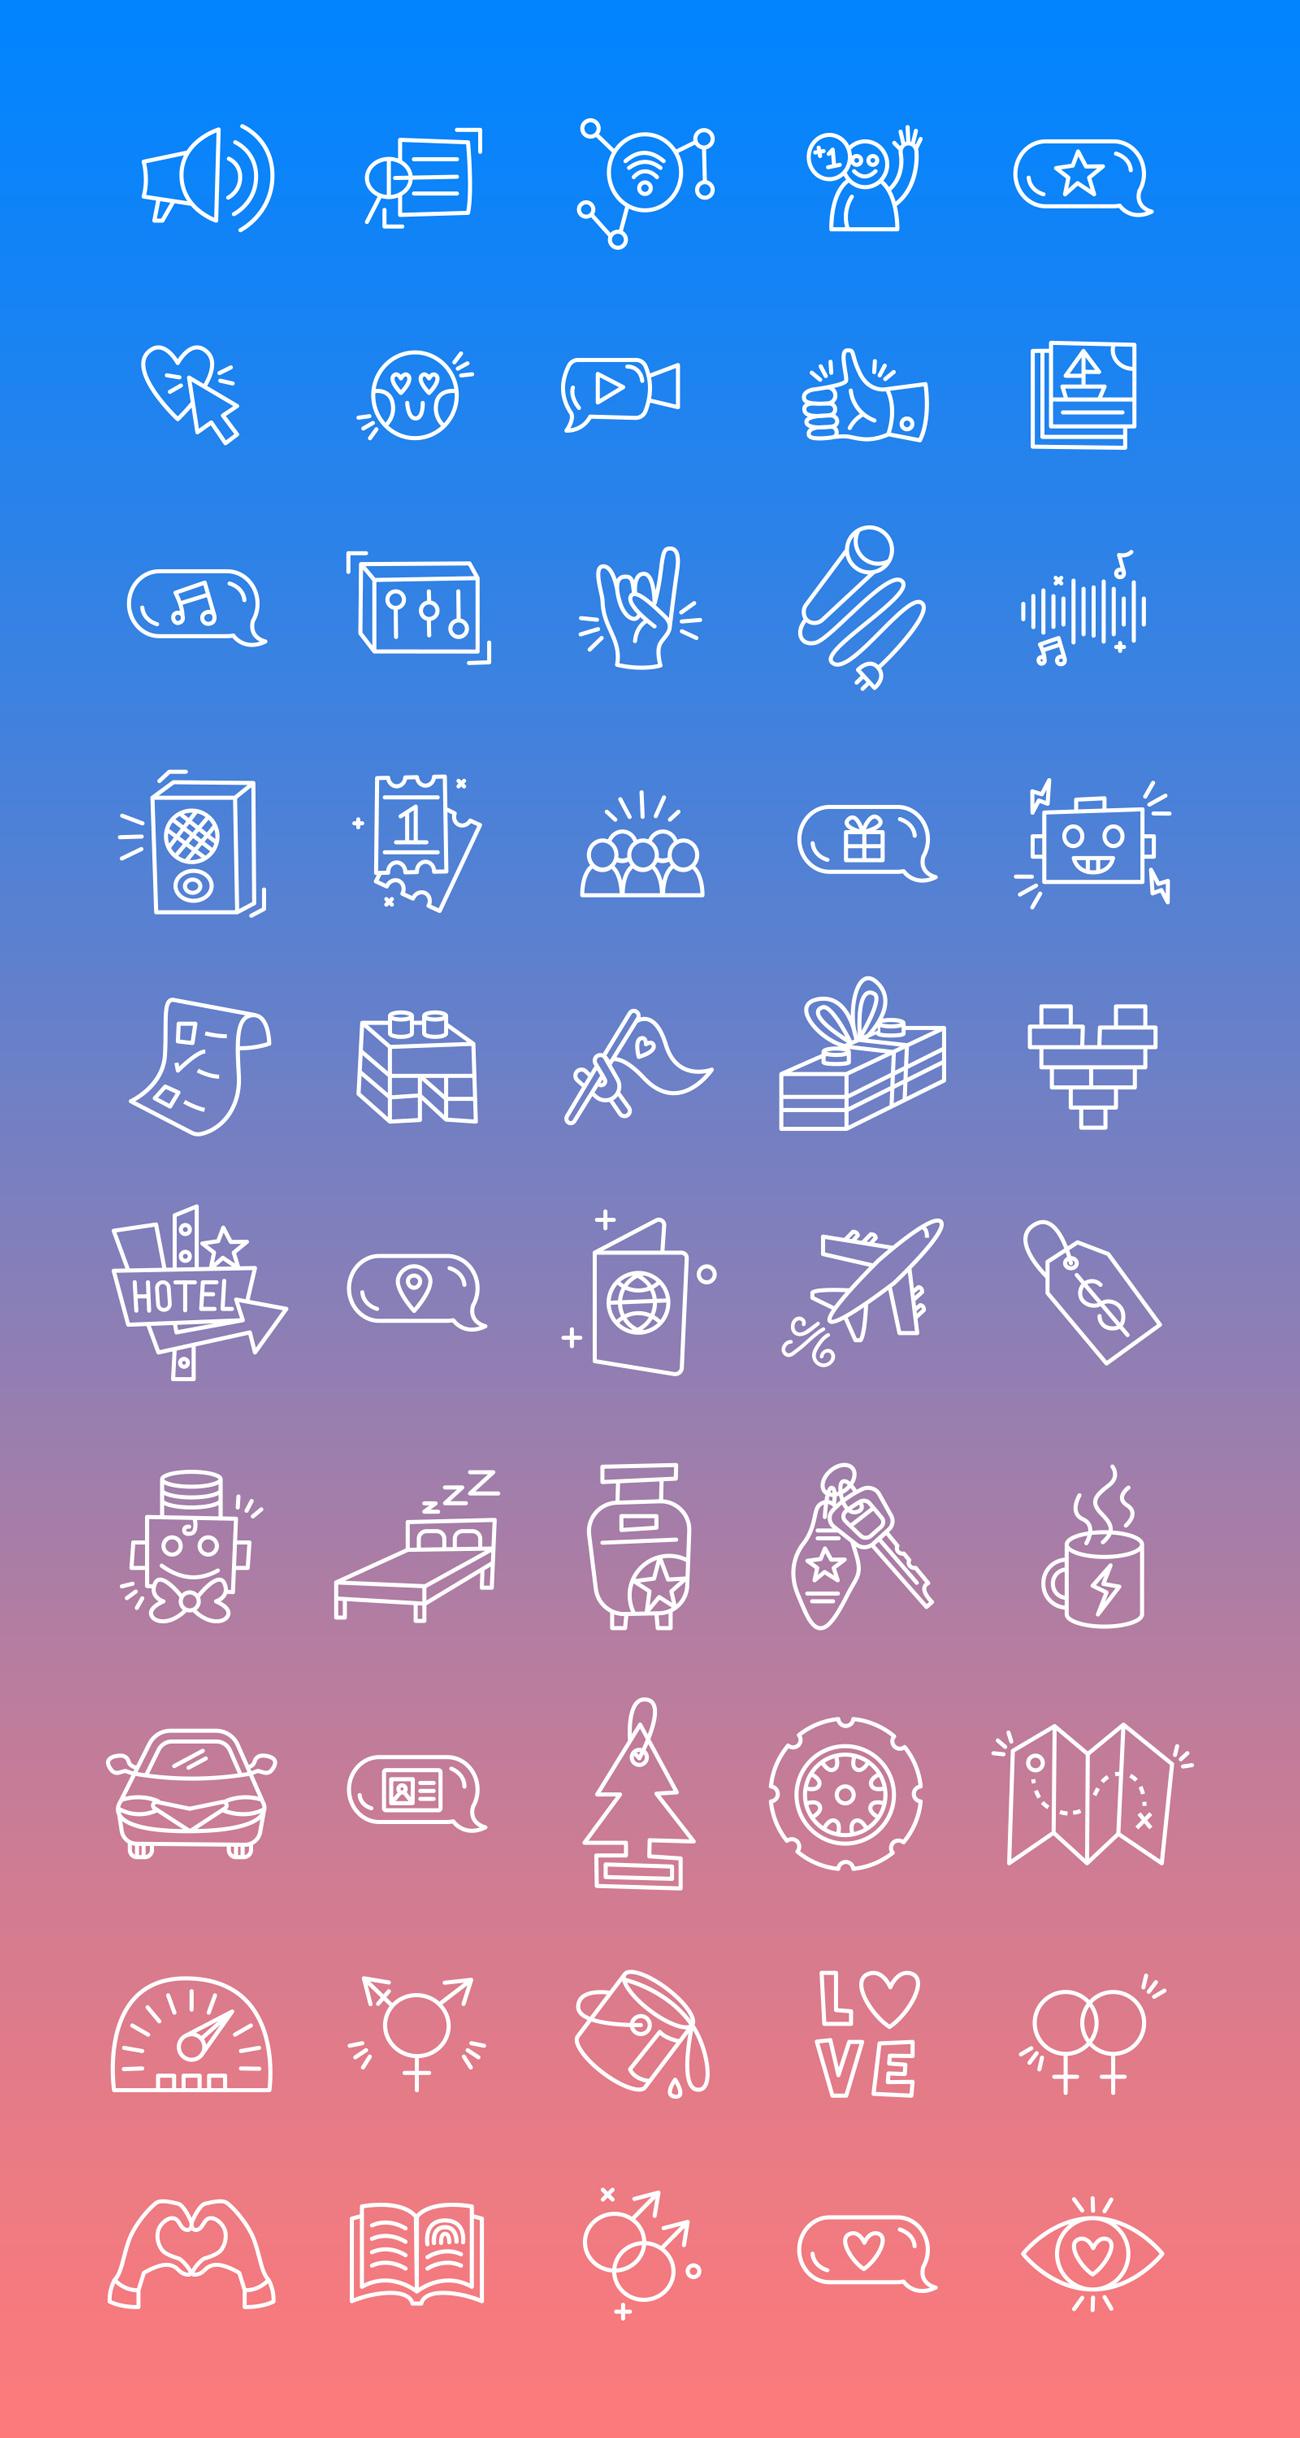 Adweek-Icons-Facebook-Messenger.jpg